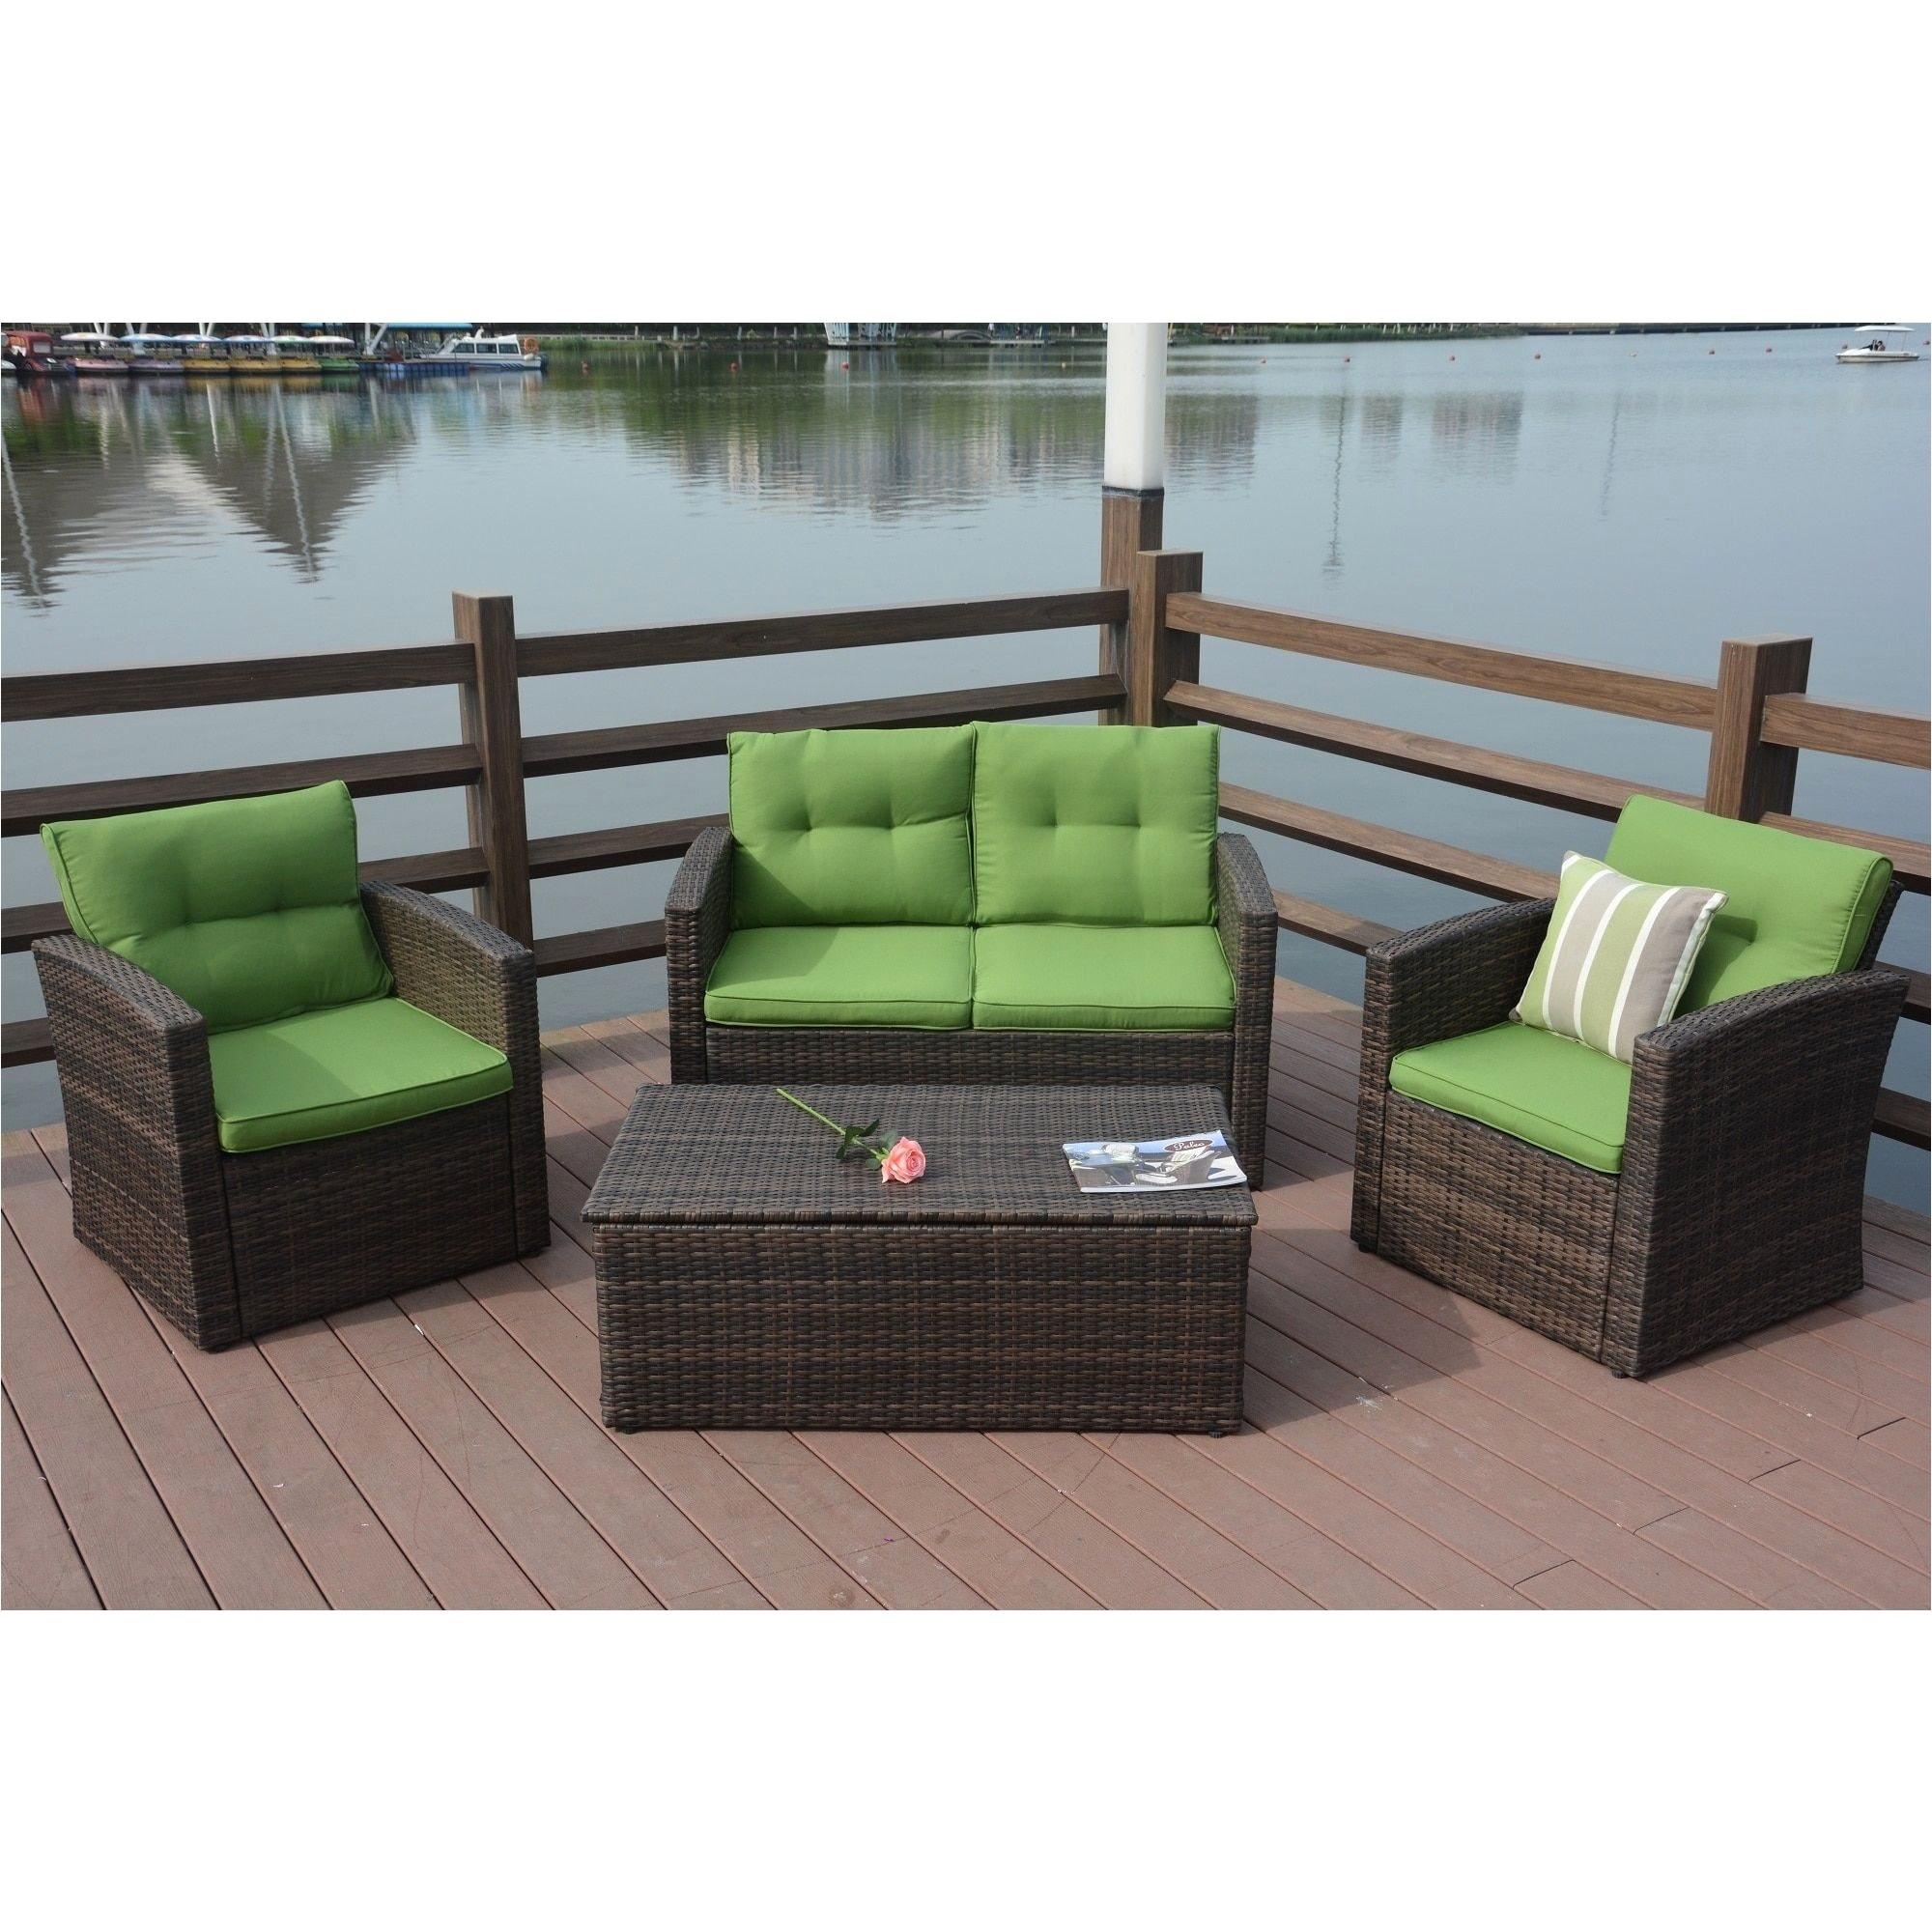 deep seat cushion set lovely patio chair cushion fresh luxuria¶s wicker outdoor sofa 0d patio 449 13